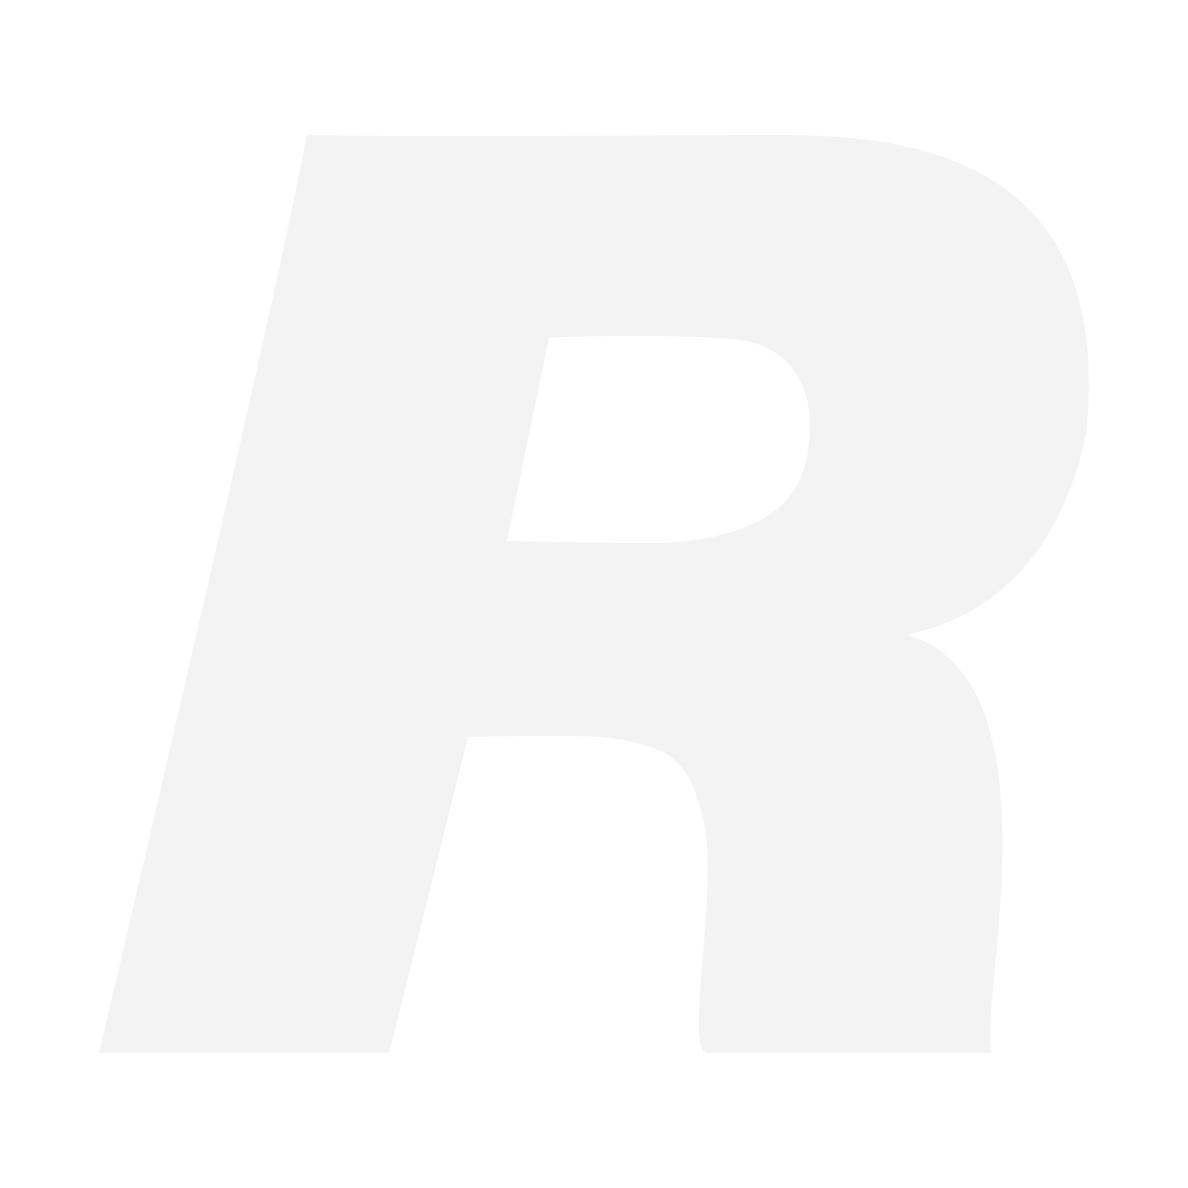 Köp Sony A7R Mark II, byt in din gamla Canon EOS 6D Mark II